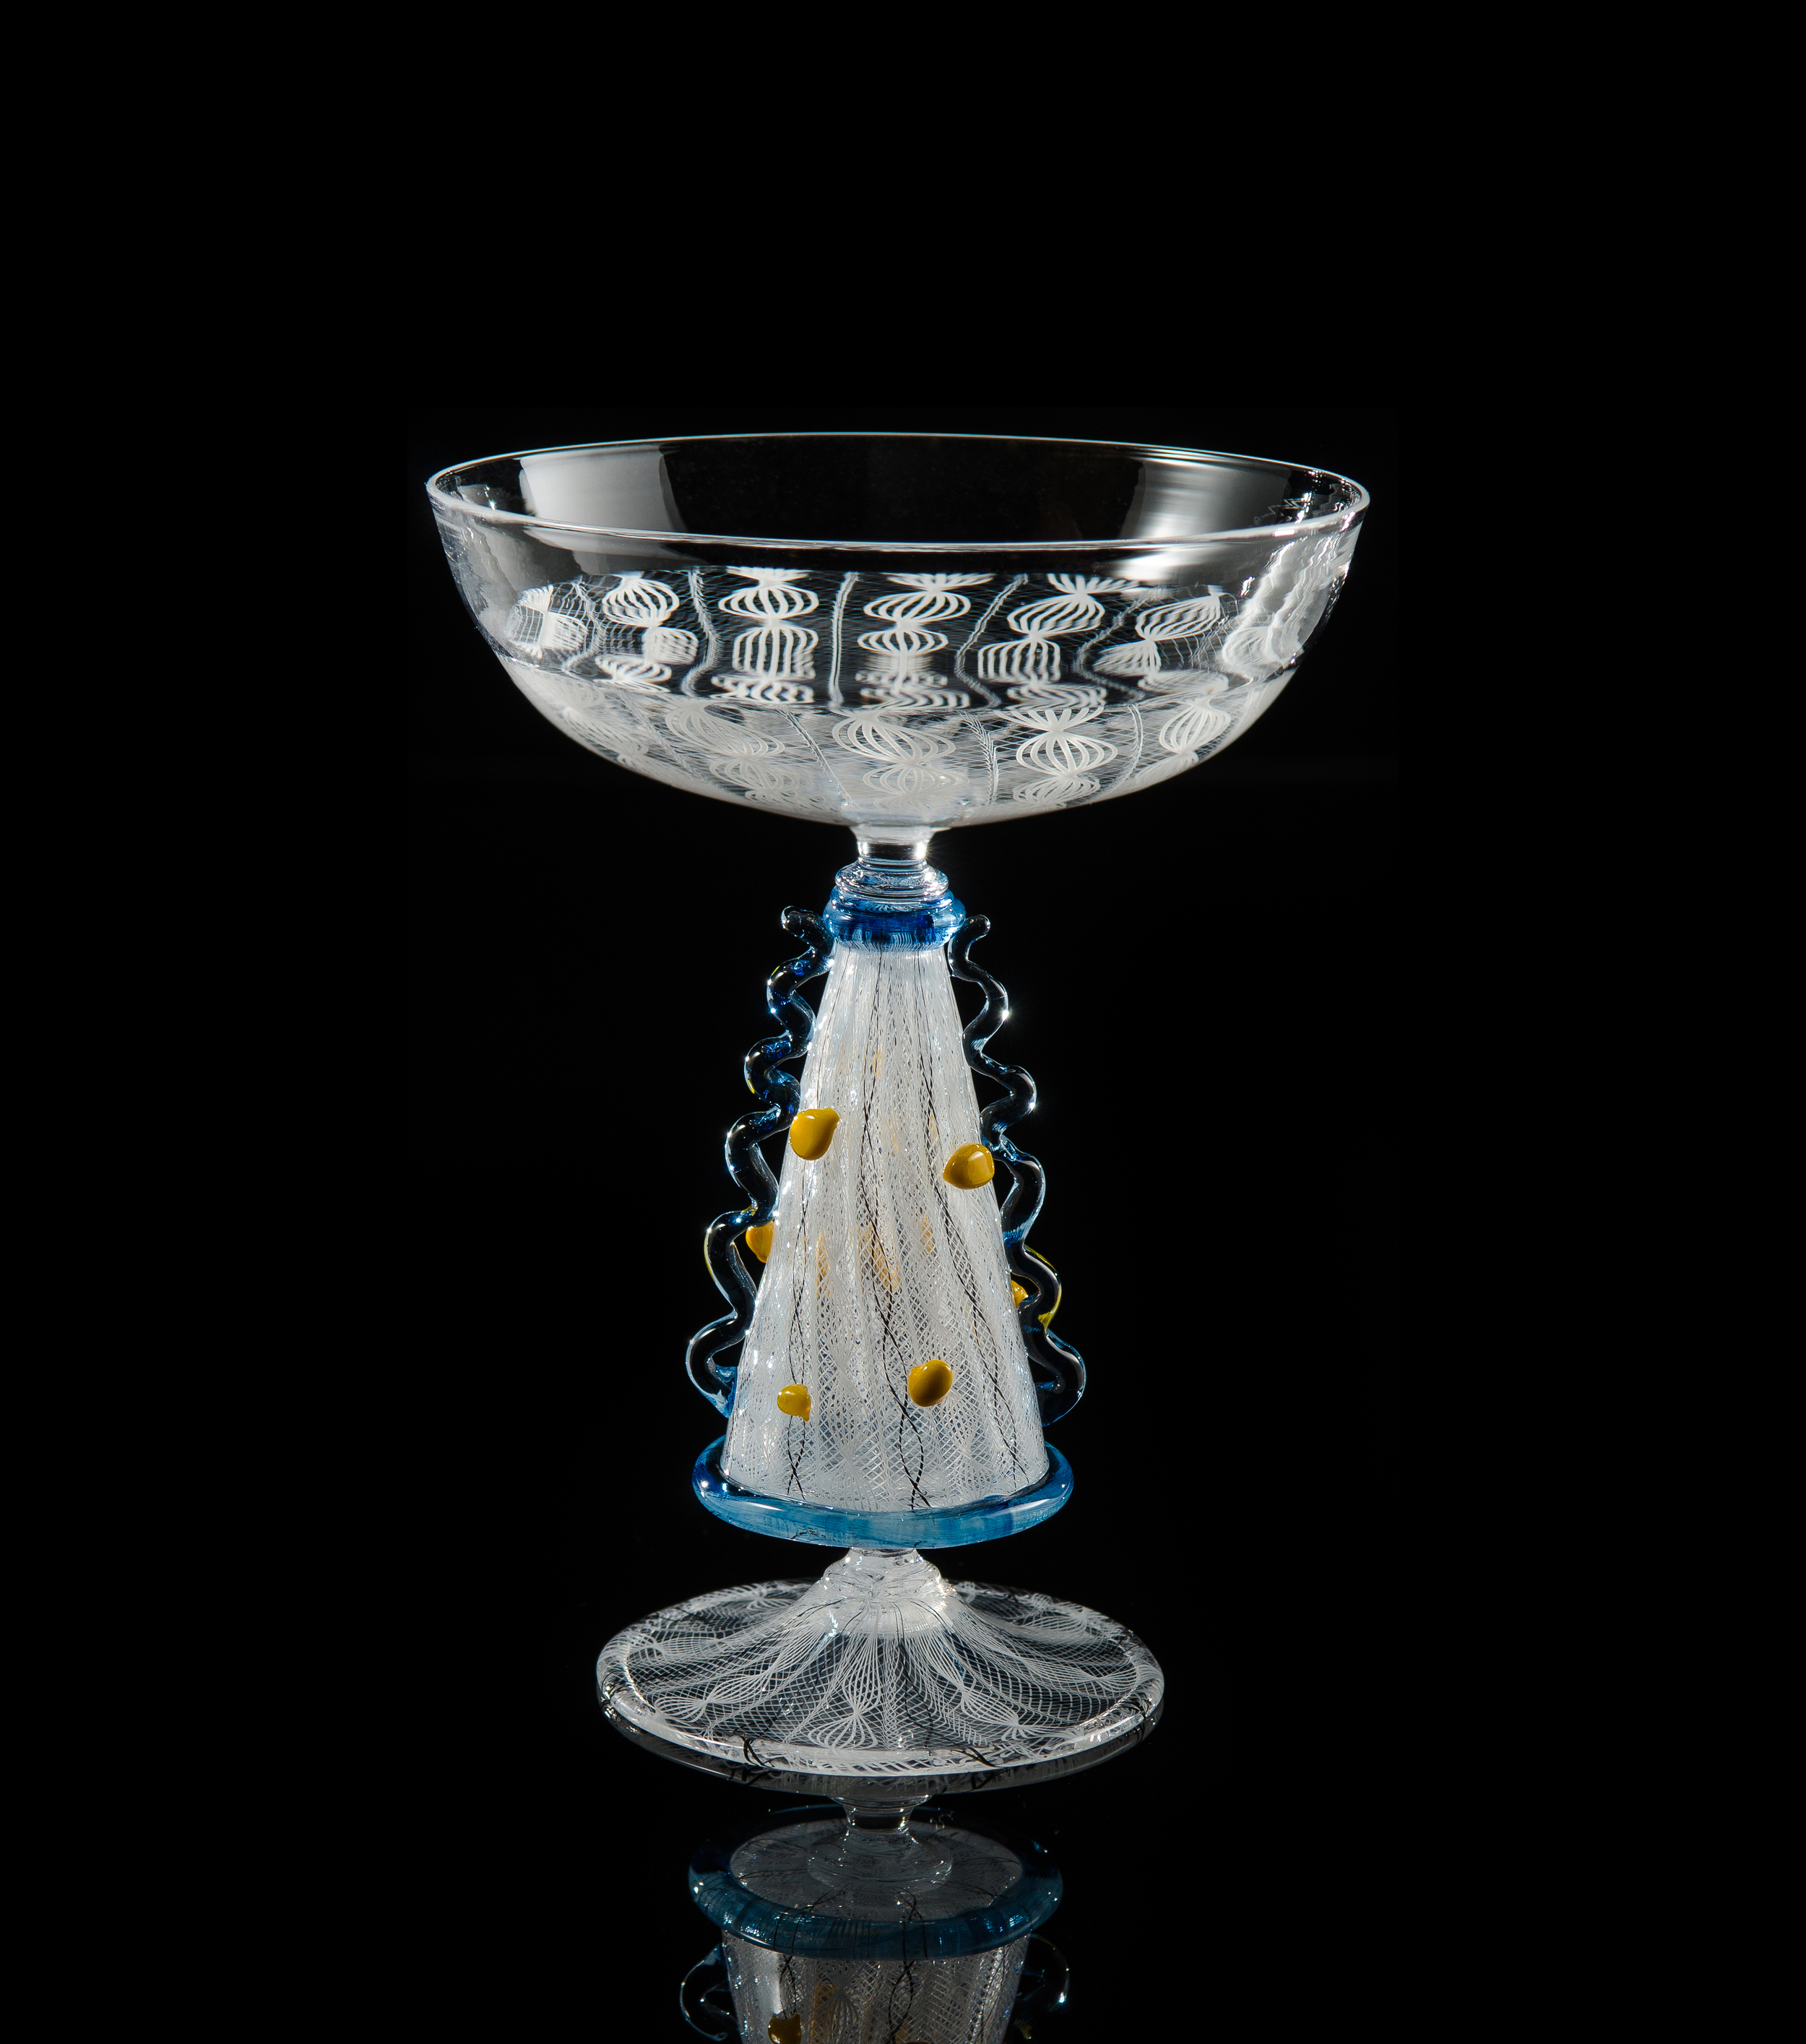 Lino Tagliapietra, Goblet (1991-1994, glass, 6 7/8 x 5 1/4 x 5 1/4inches), LT.29